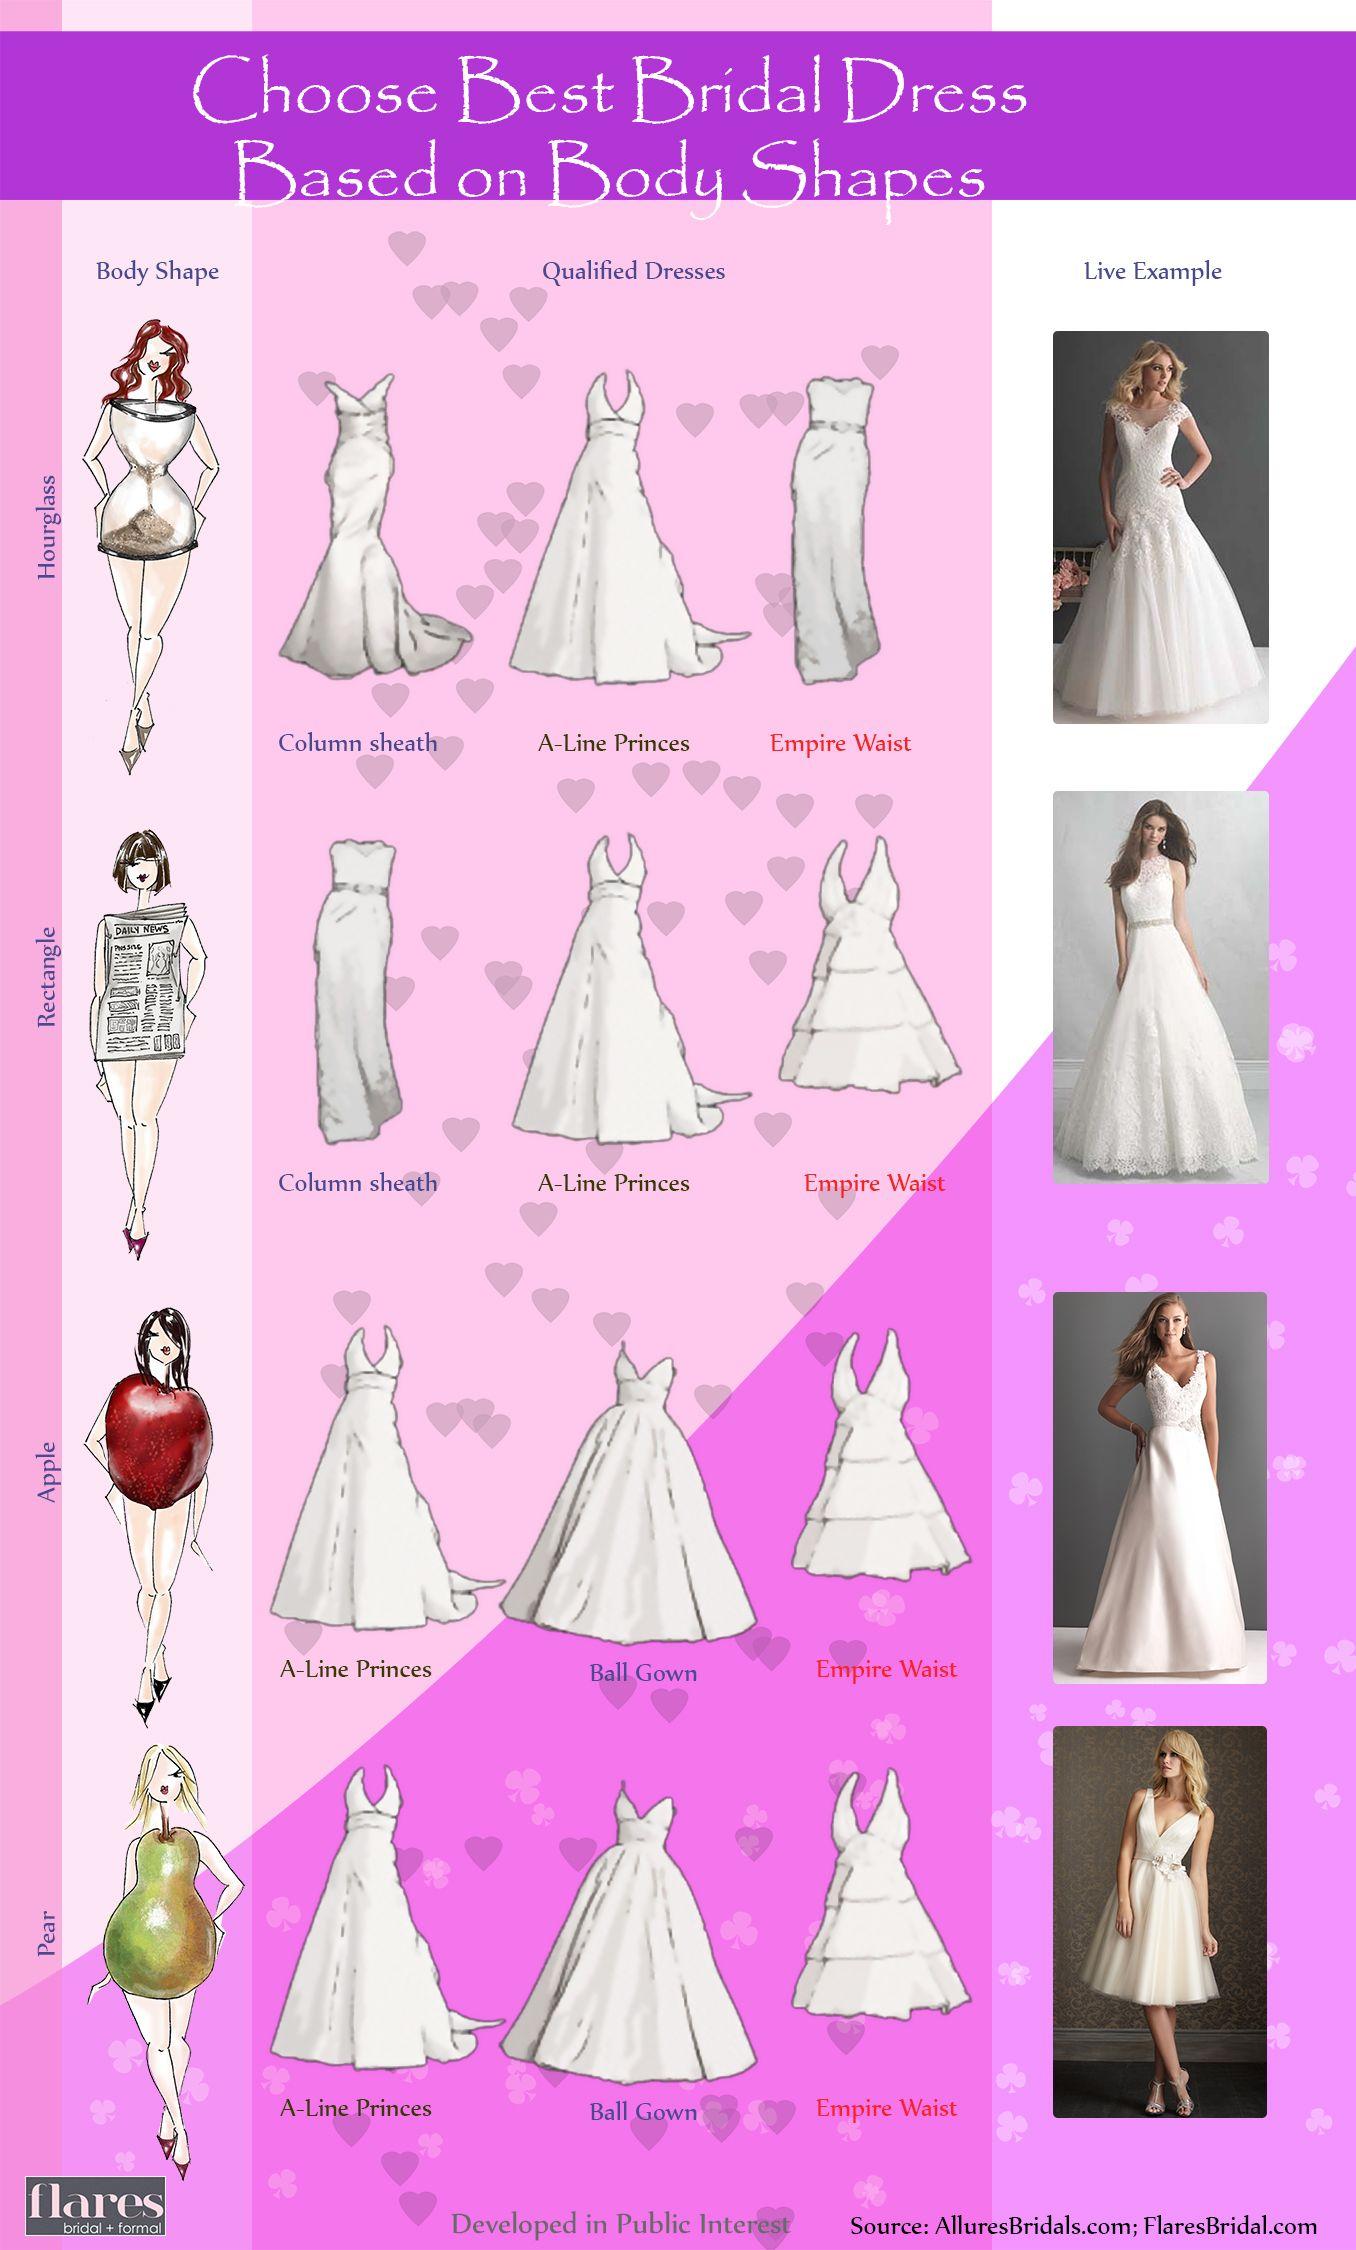 Seosurfer Infogrpahics Choose Best Bridal Dress Based On Body Shapes Wedding Dress Shapes Pick Wedding Dress Wedding Dress Types